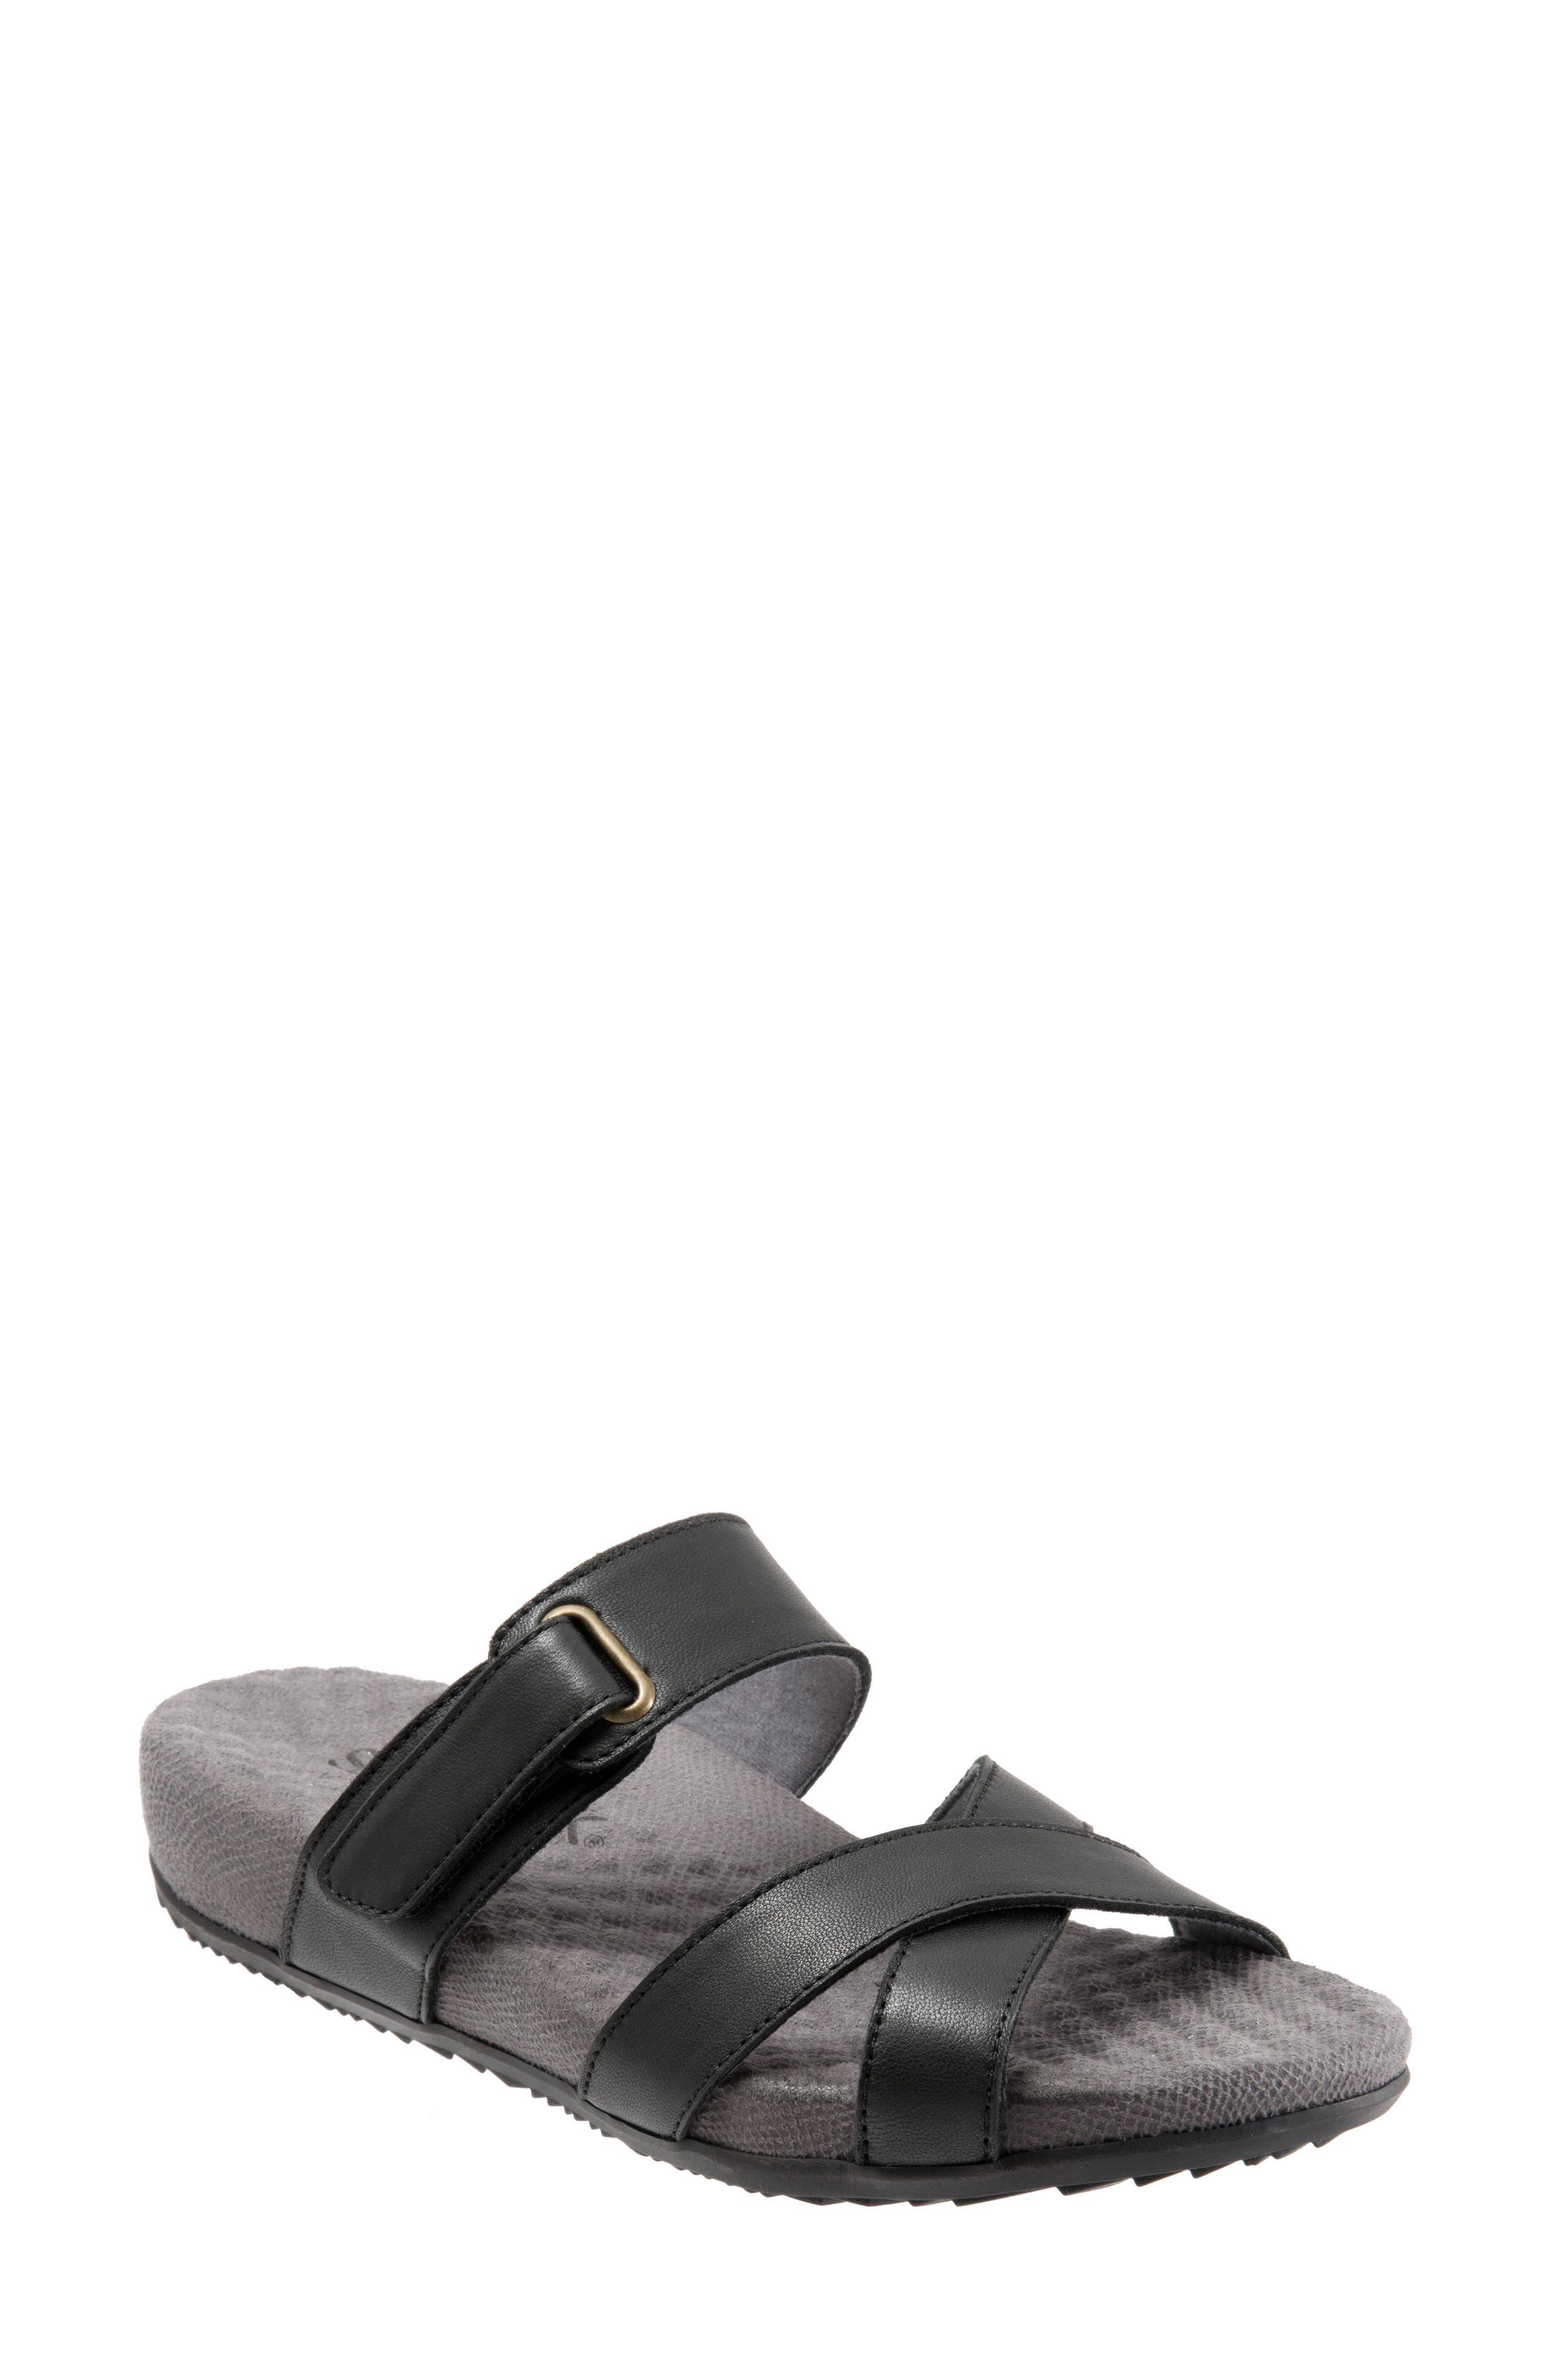 Brimley Sandal, Main, color, BLACK LEATHER